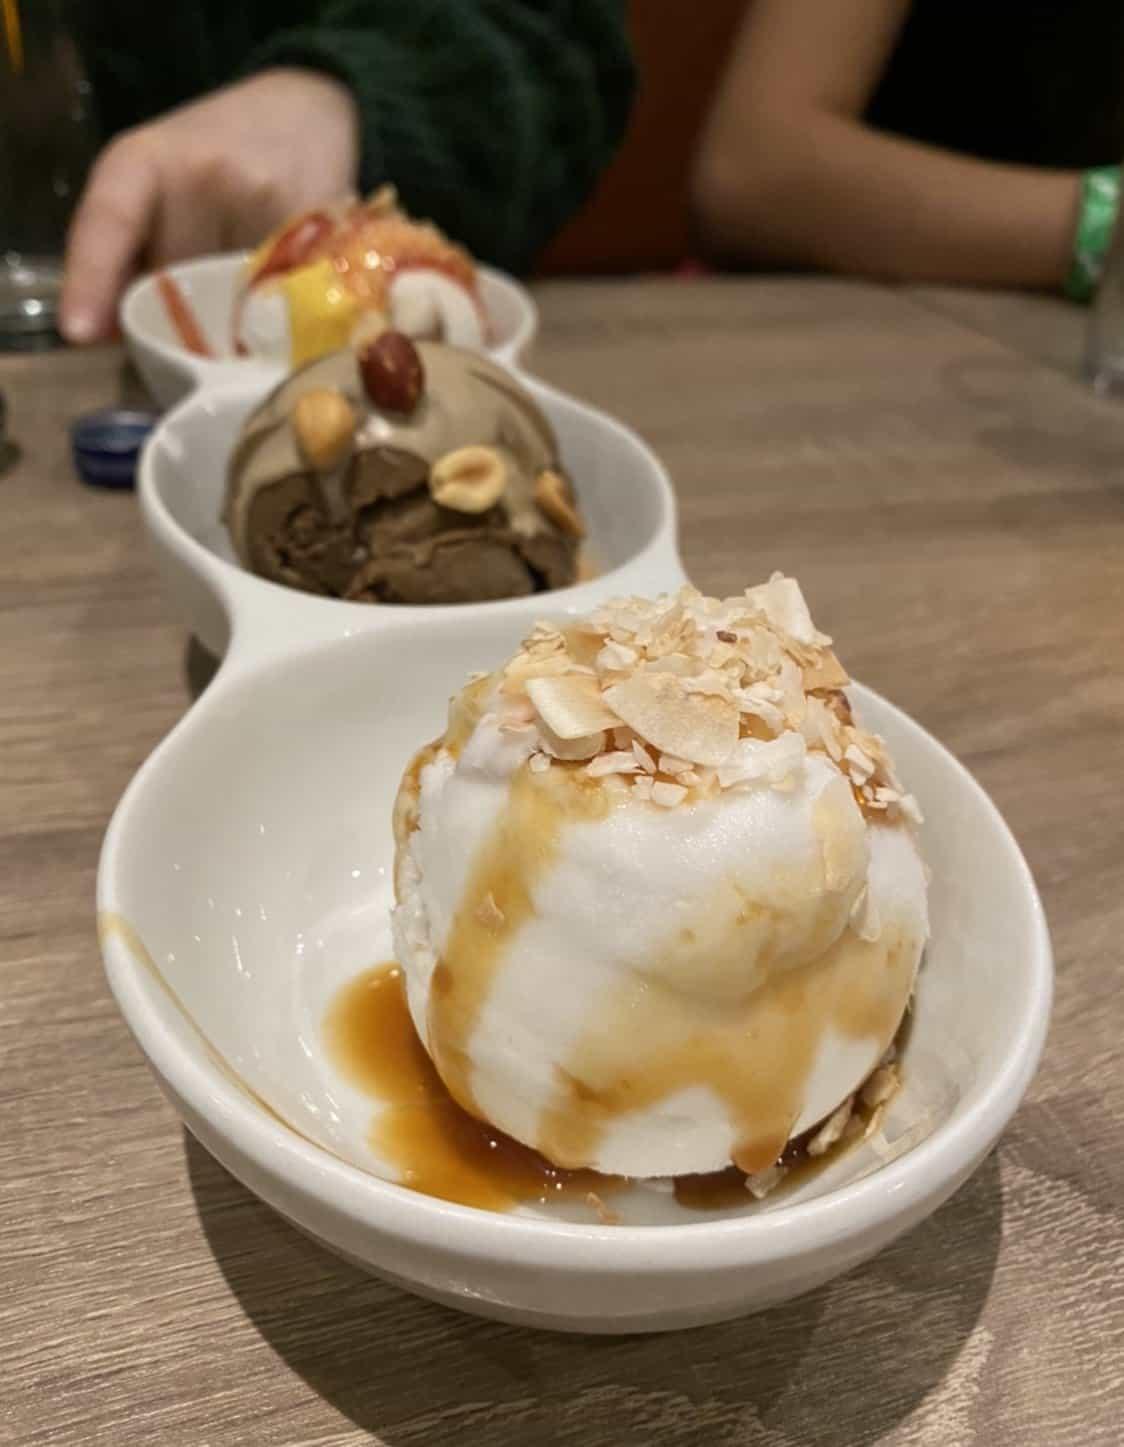 coconut, chocolate, and vanilla vegan ice cream